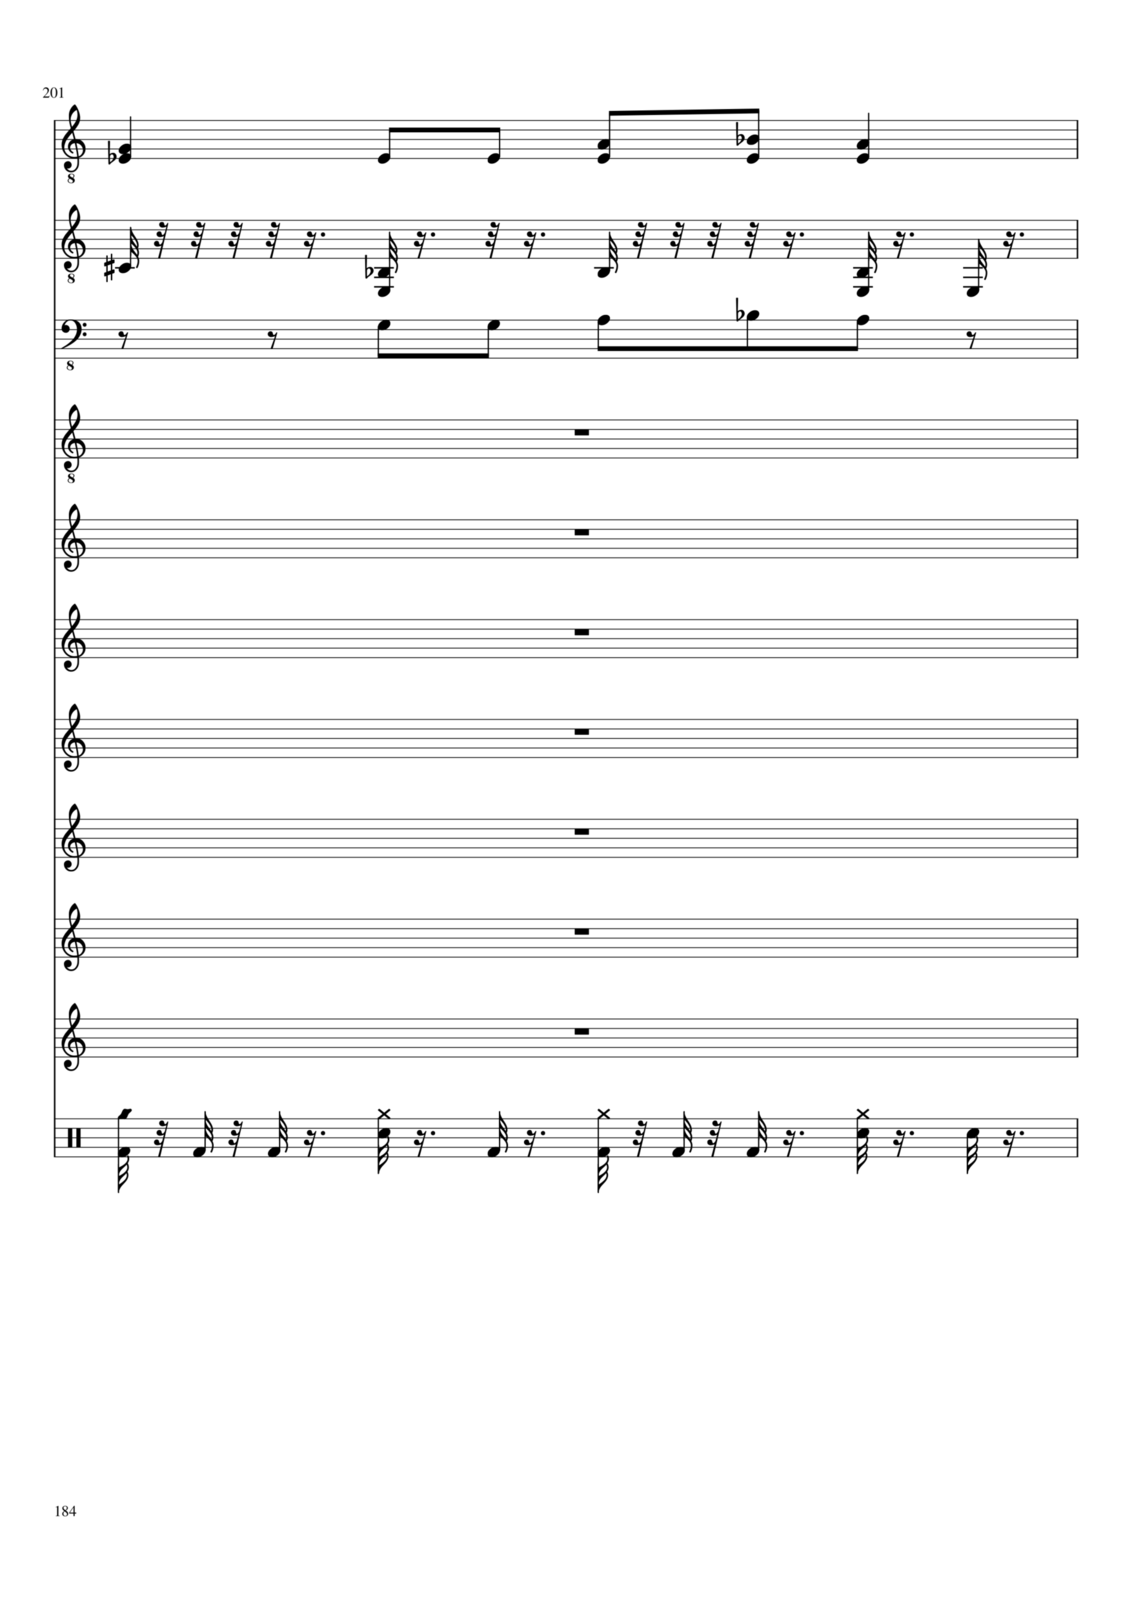 Belyiy sokol slide, Image 184